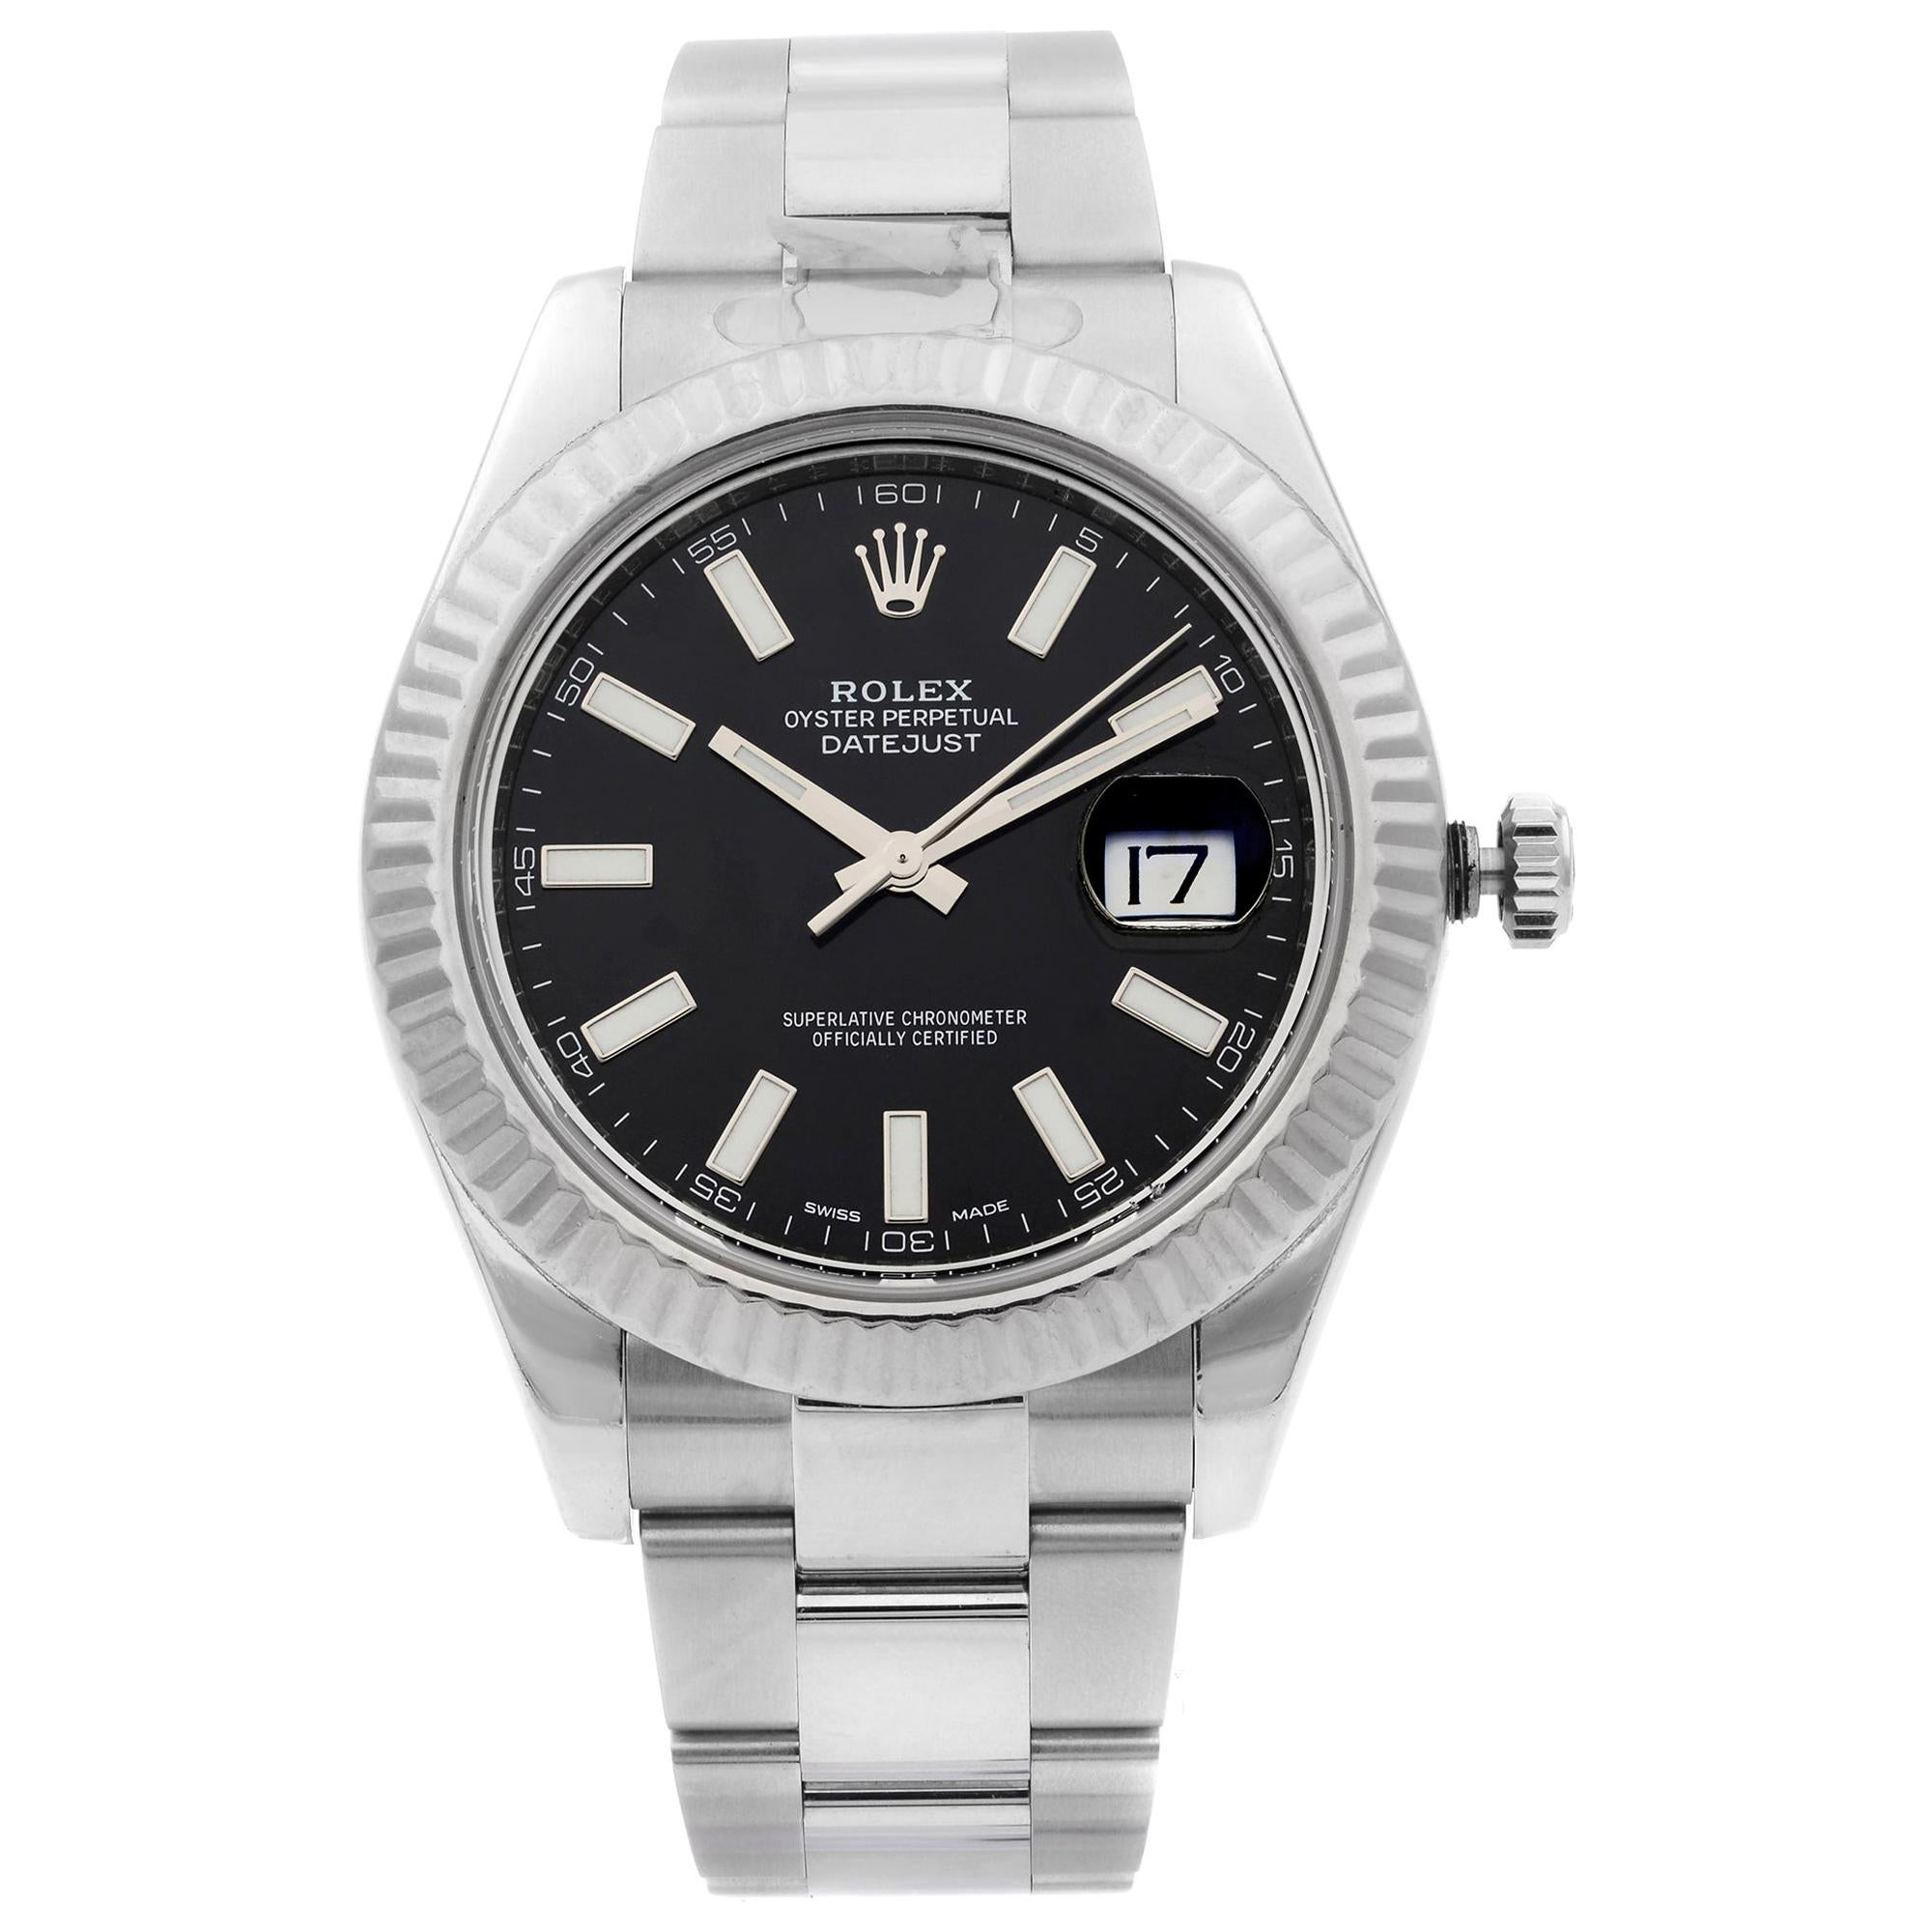 Rolex Datejust Steel 18 Karat White Gold Black Dial Automatic Men's Watch 116334